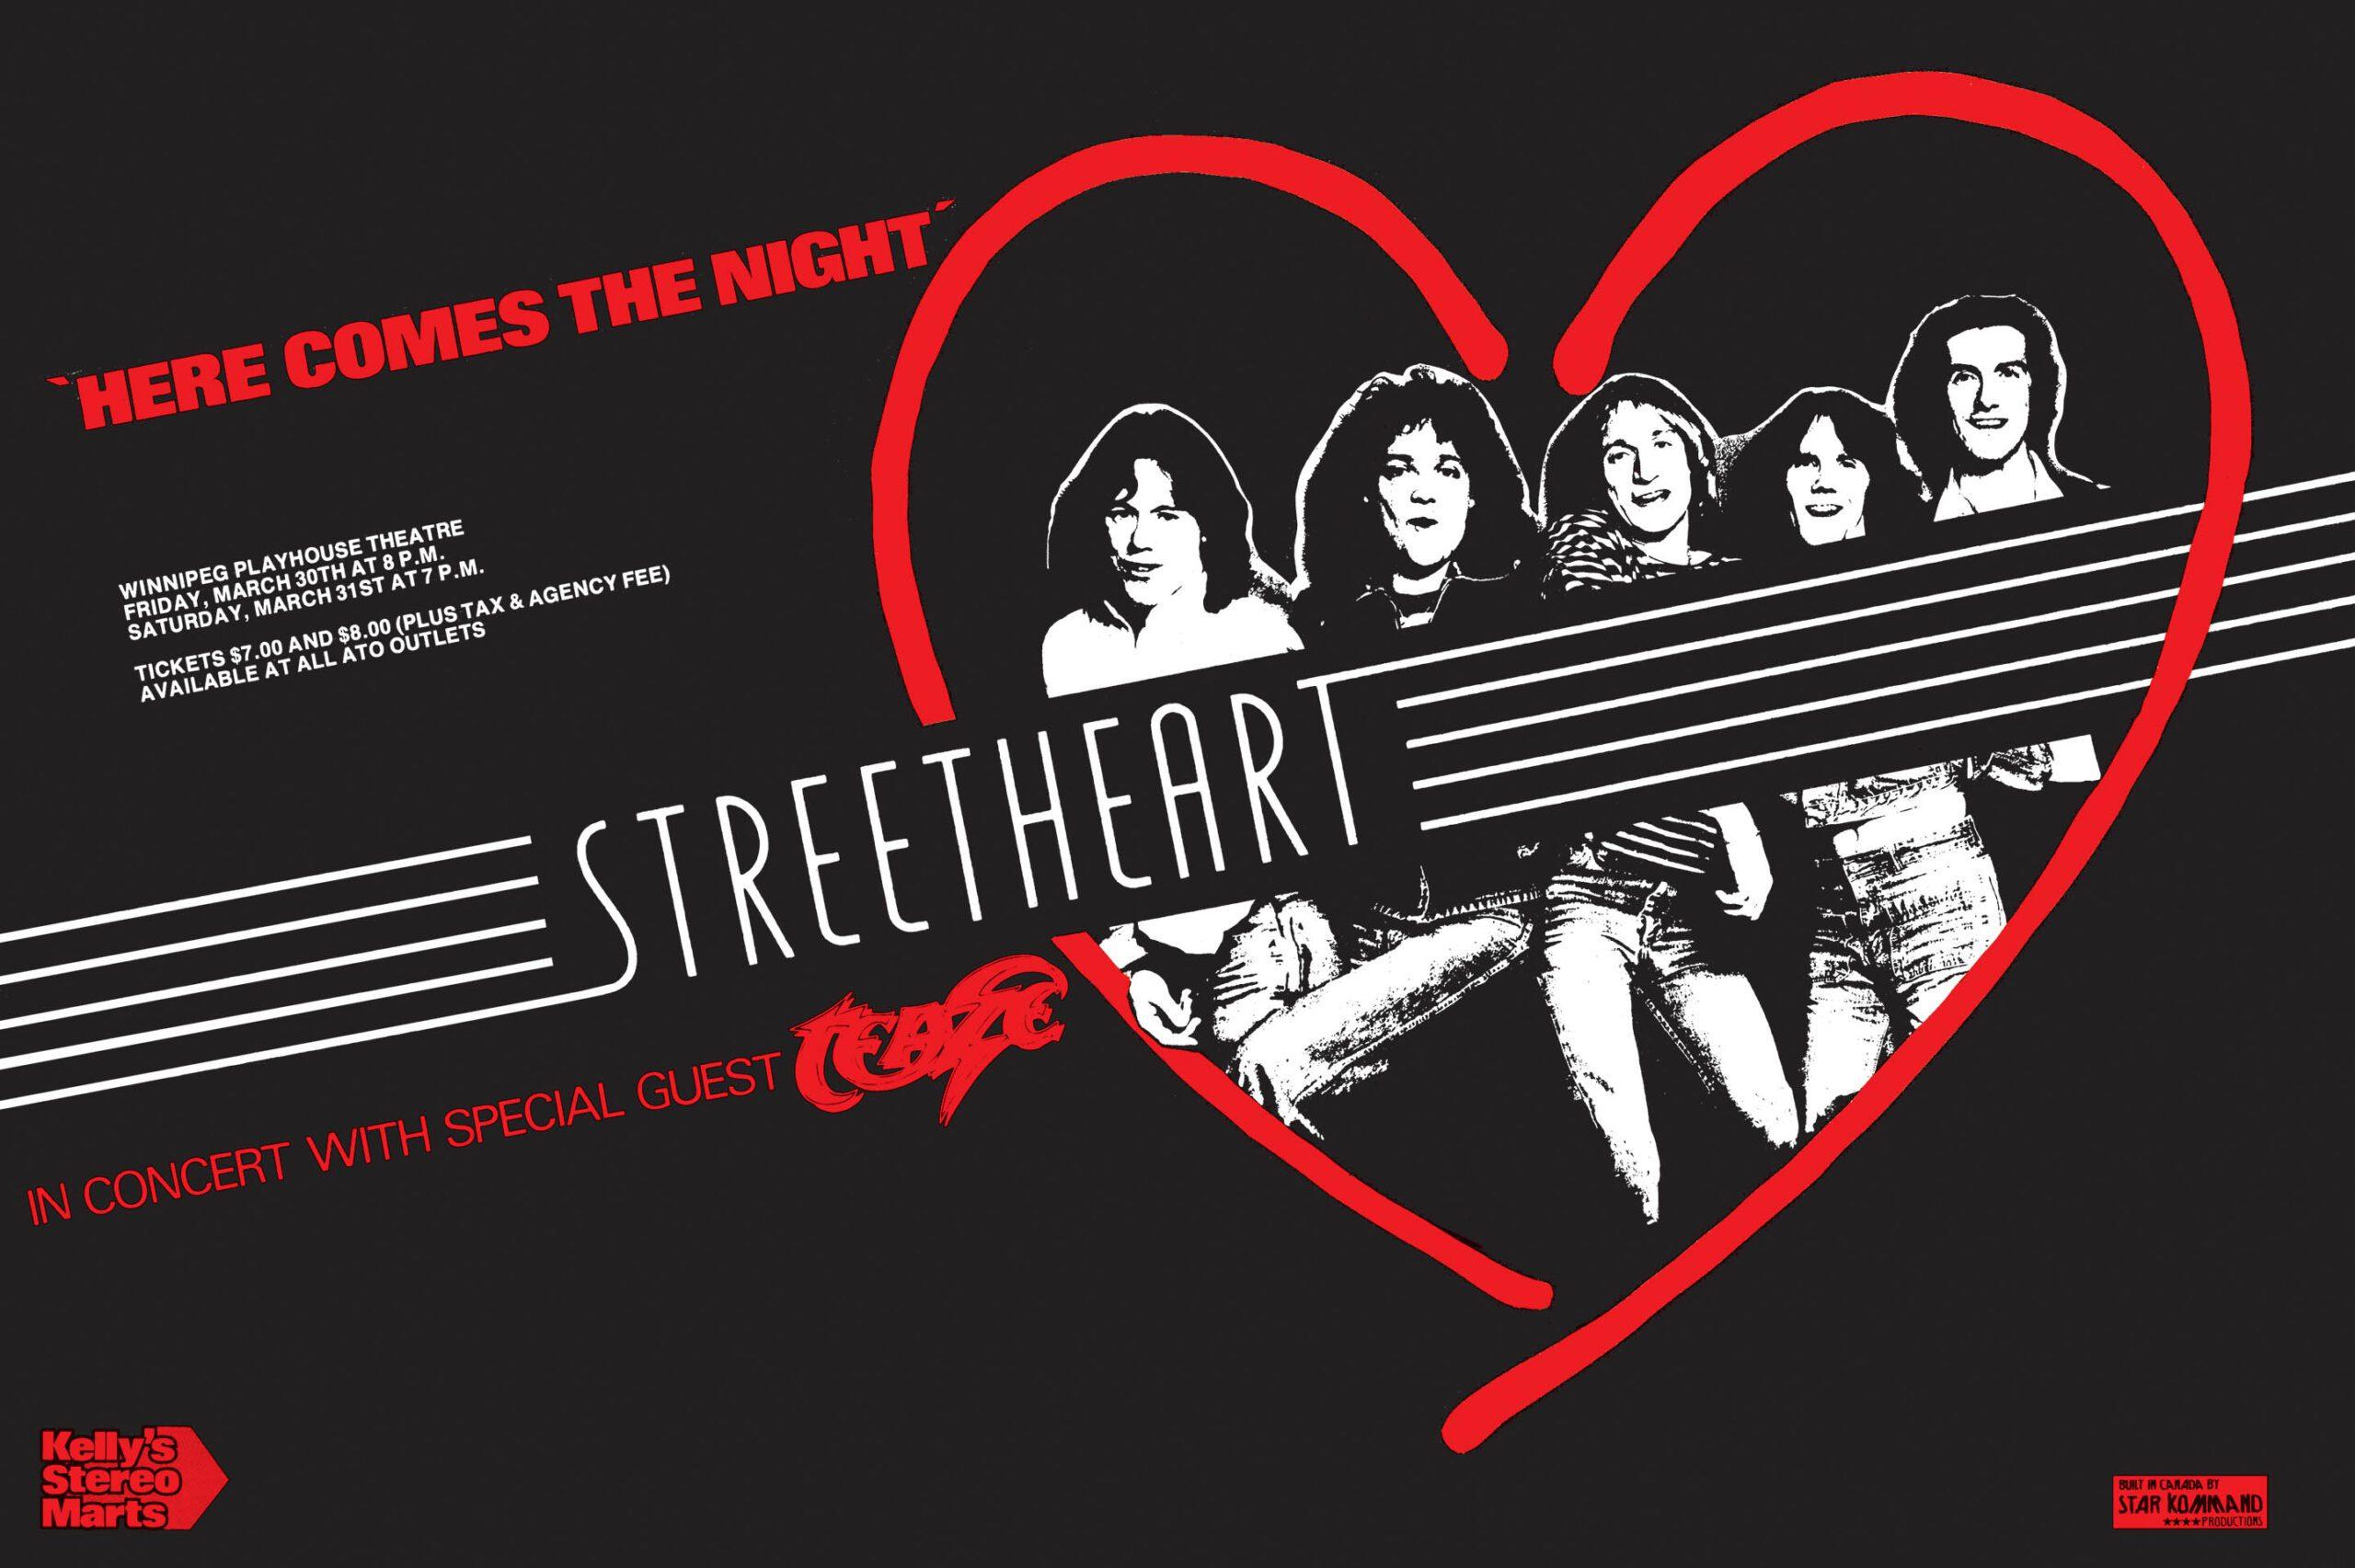 Streetheart & Teaze – 2 – 1979